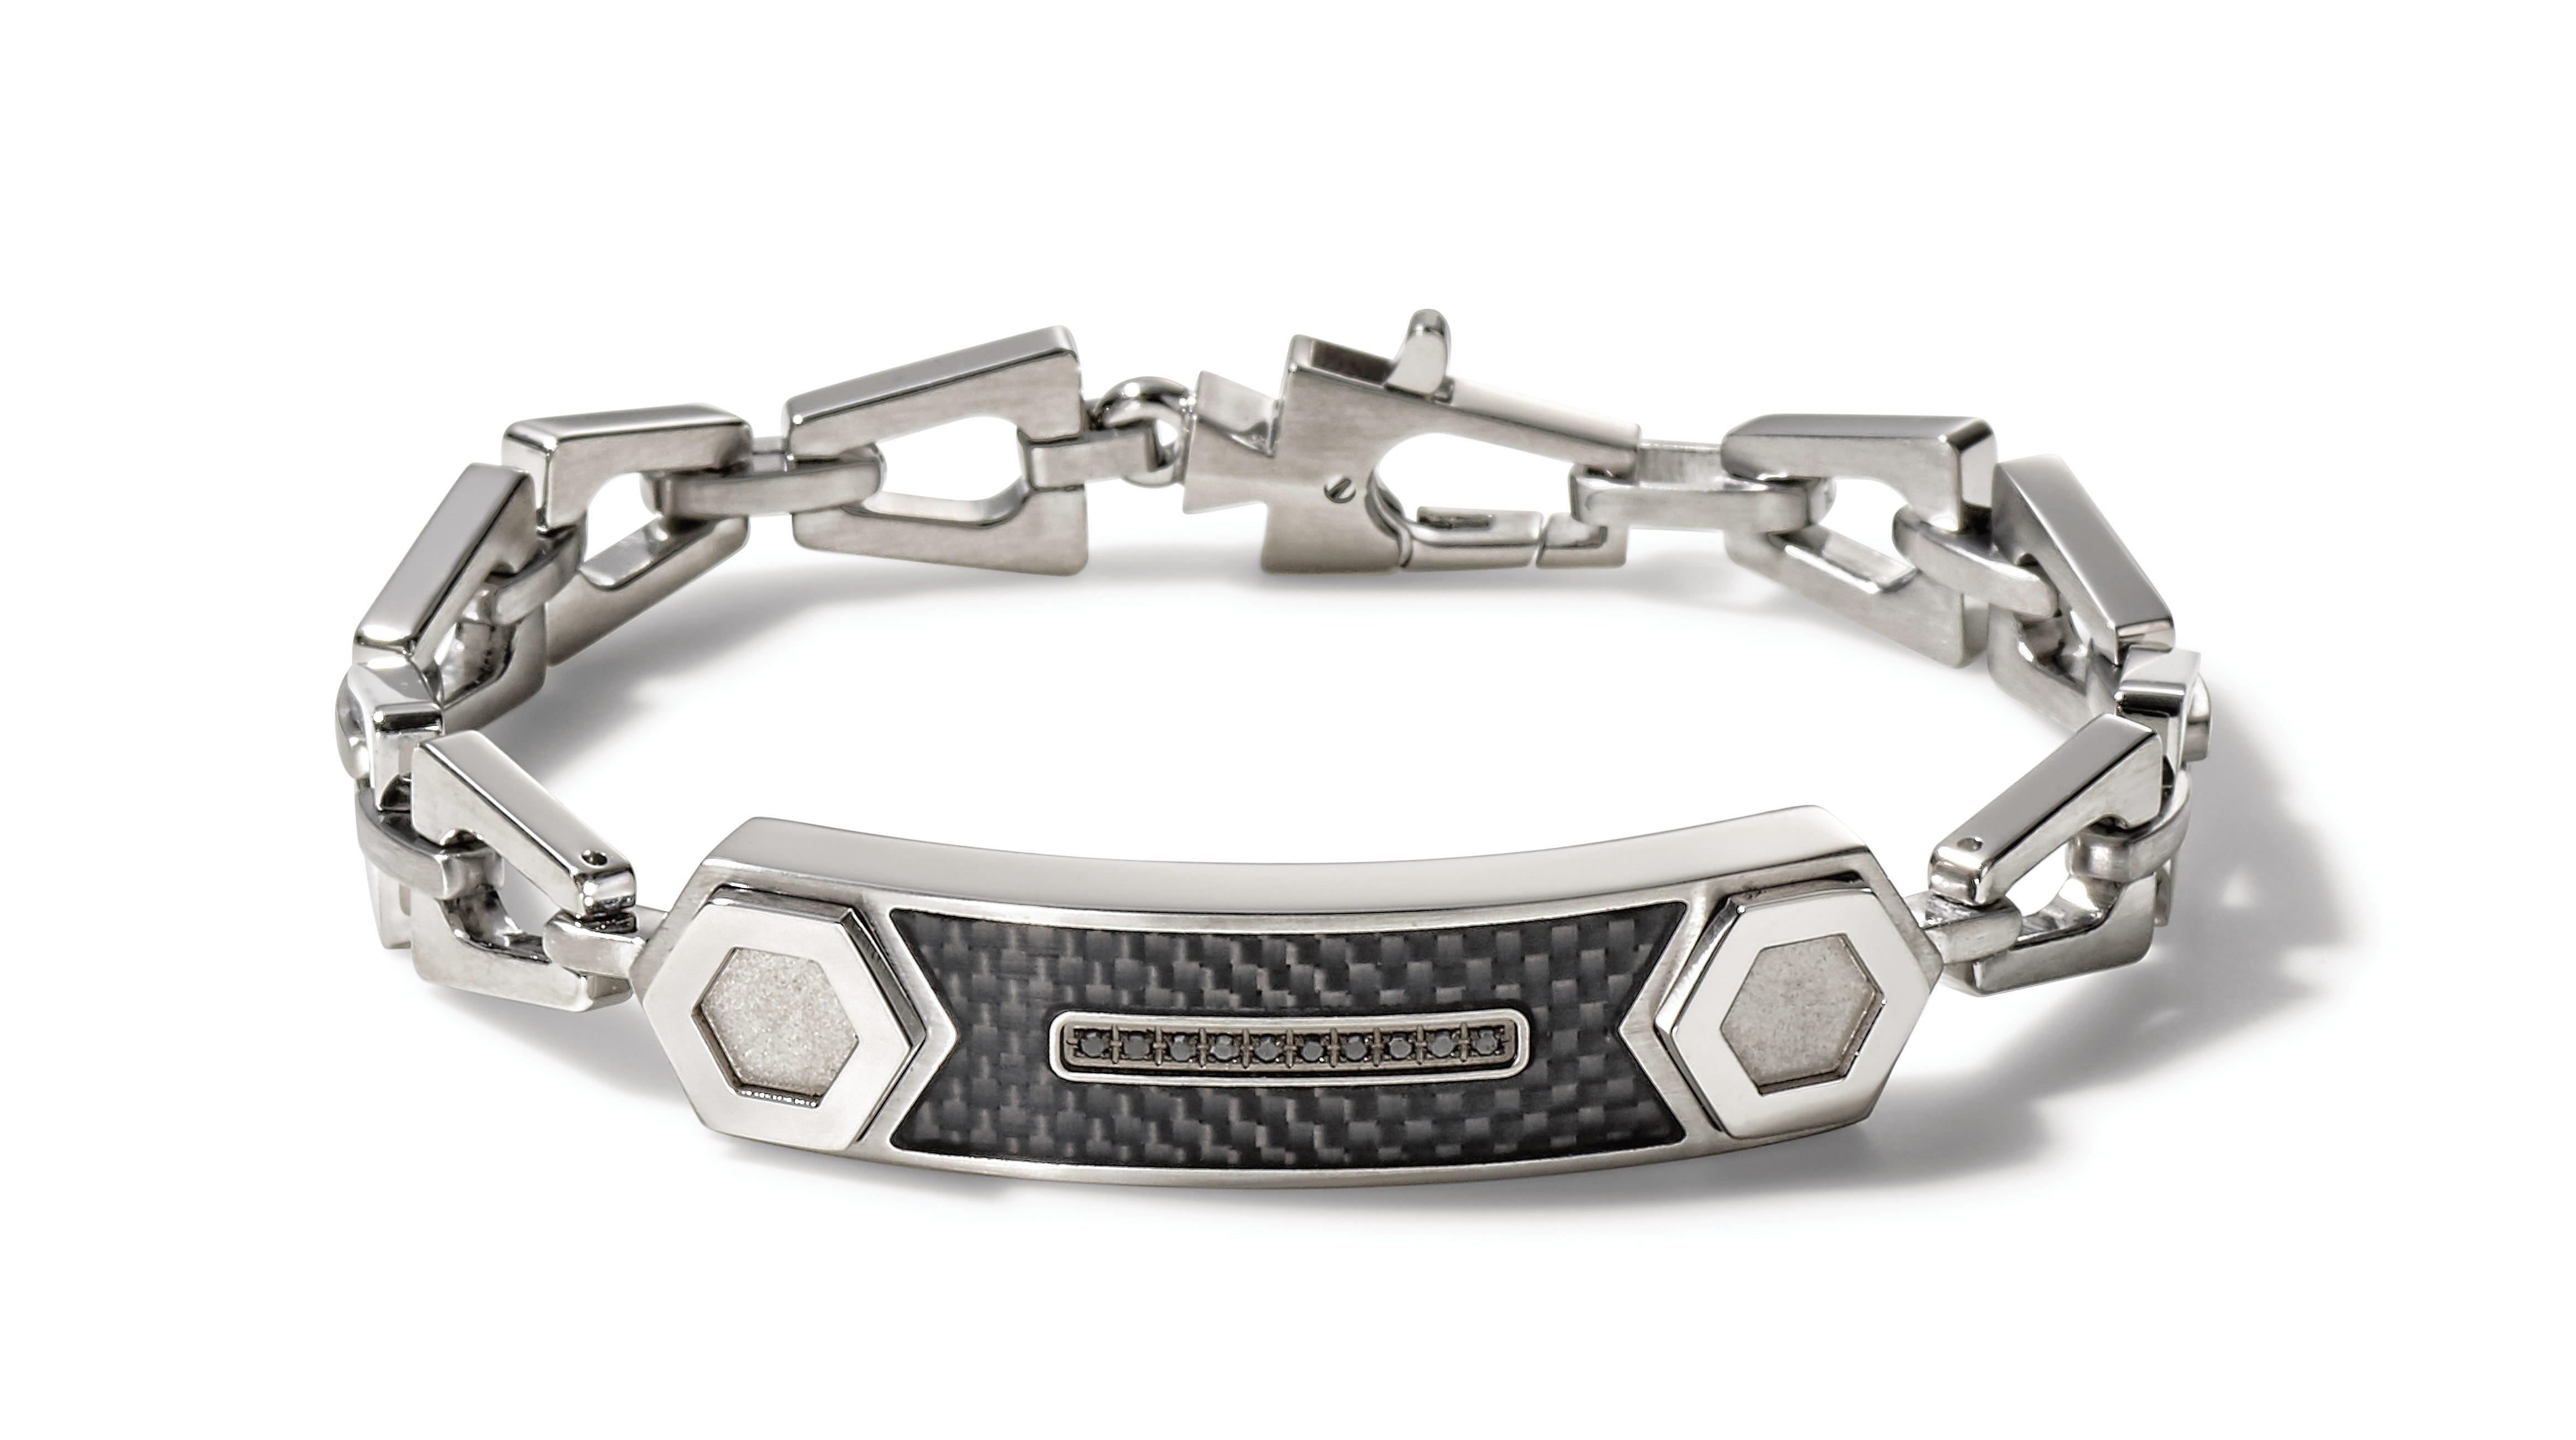 Bulova Precisionist Bracelet in Stainless Steel J96B001L